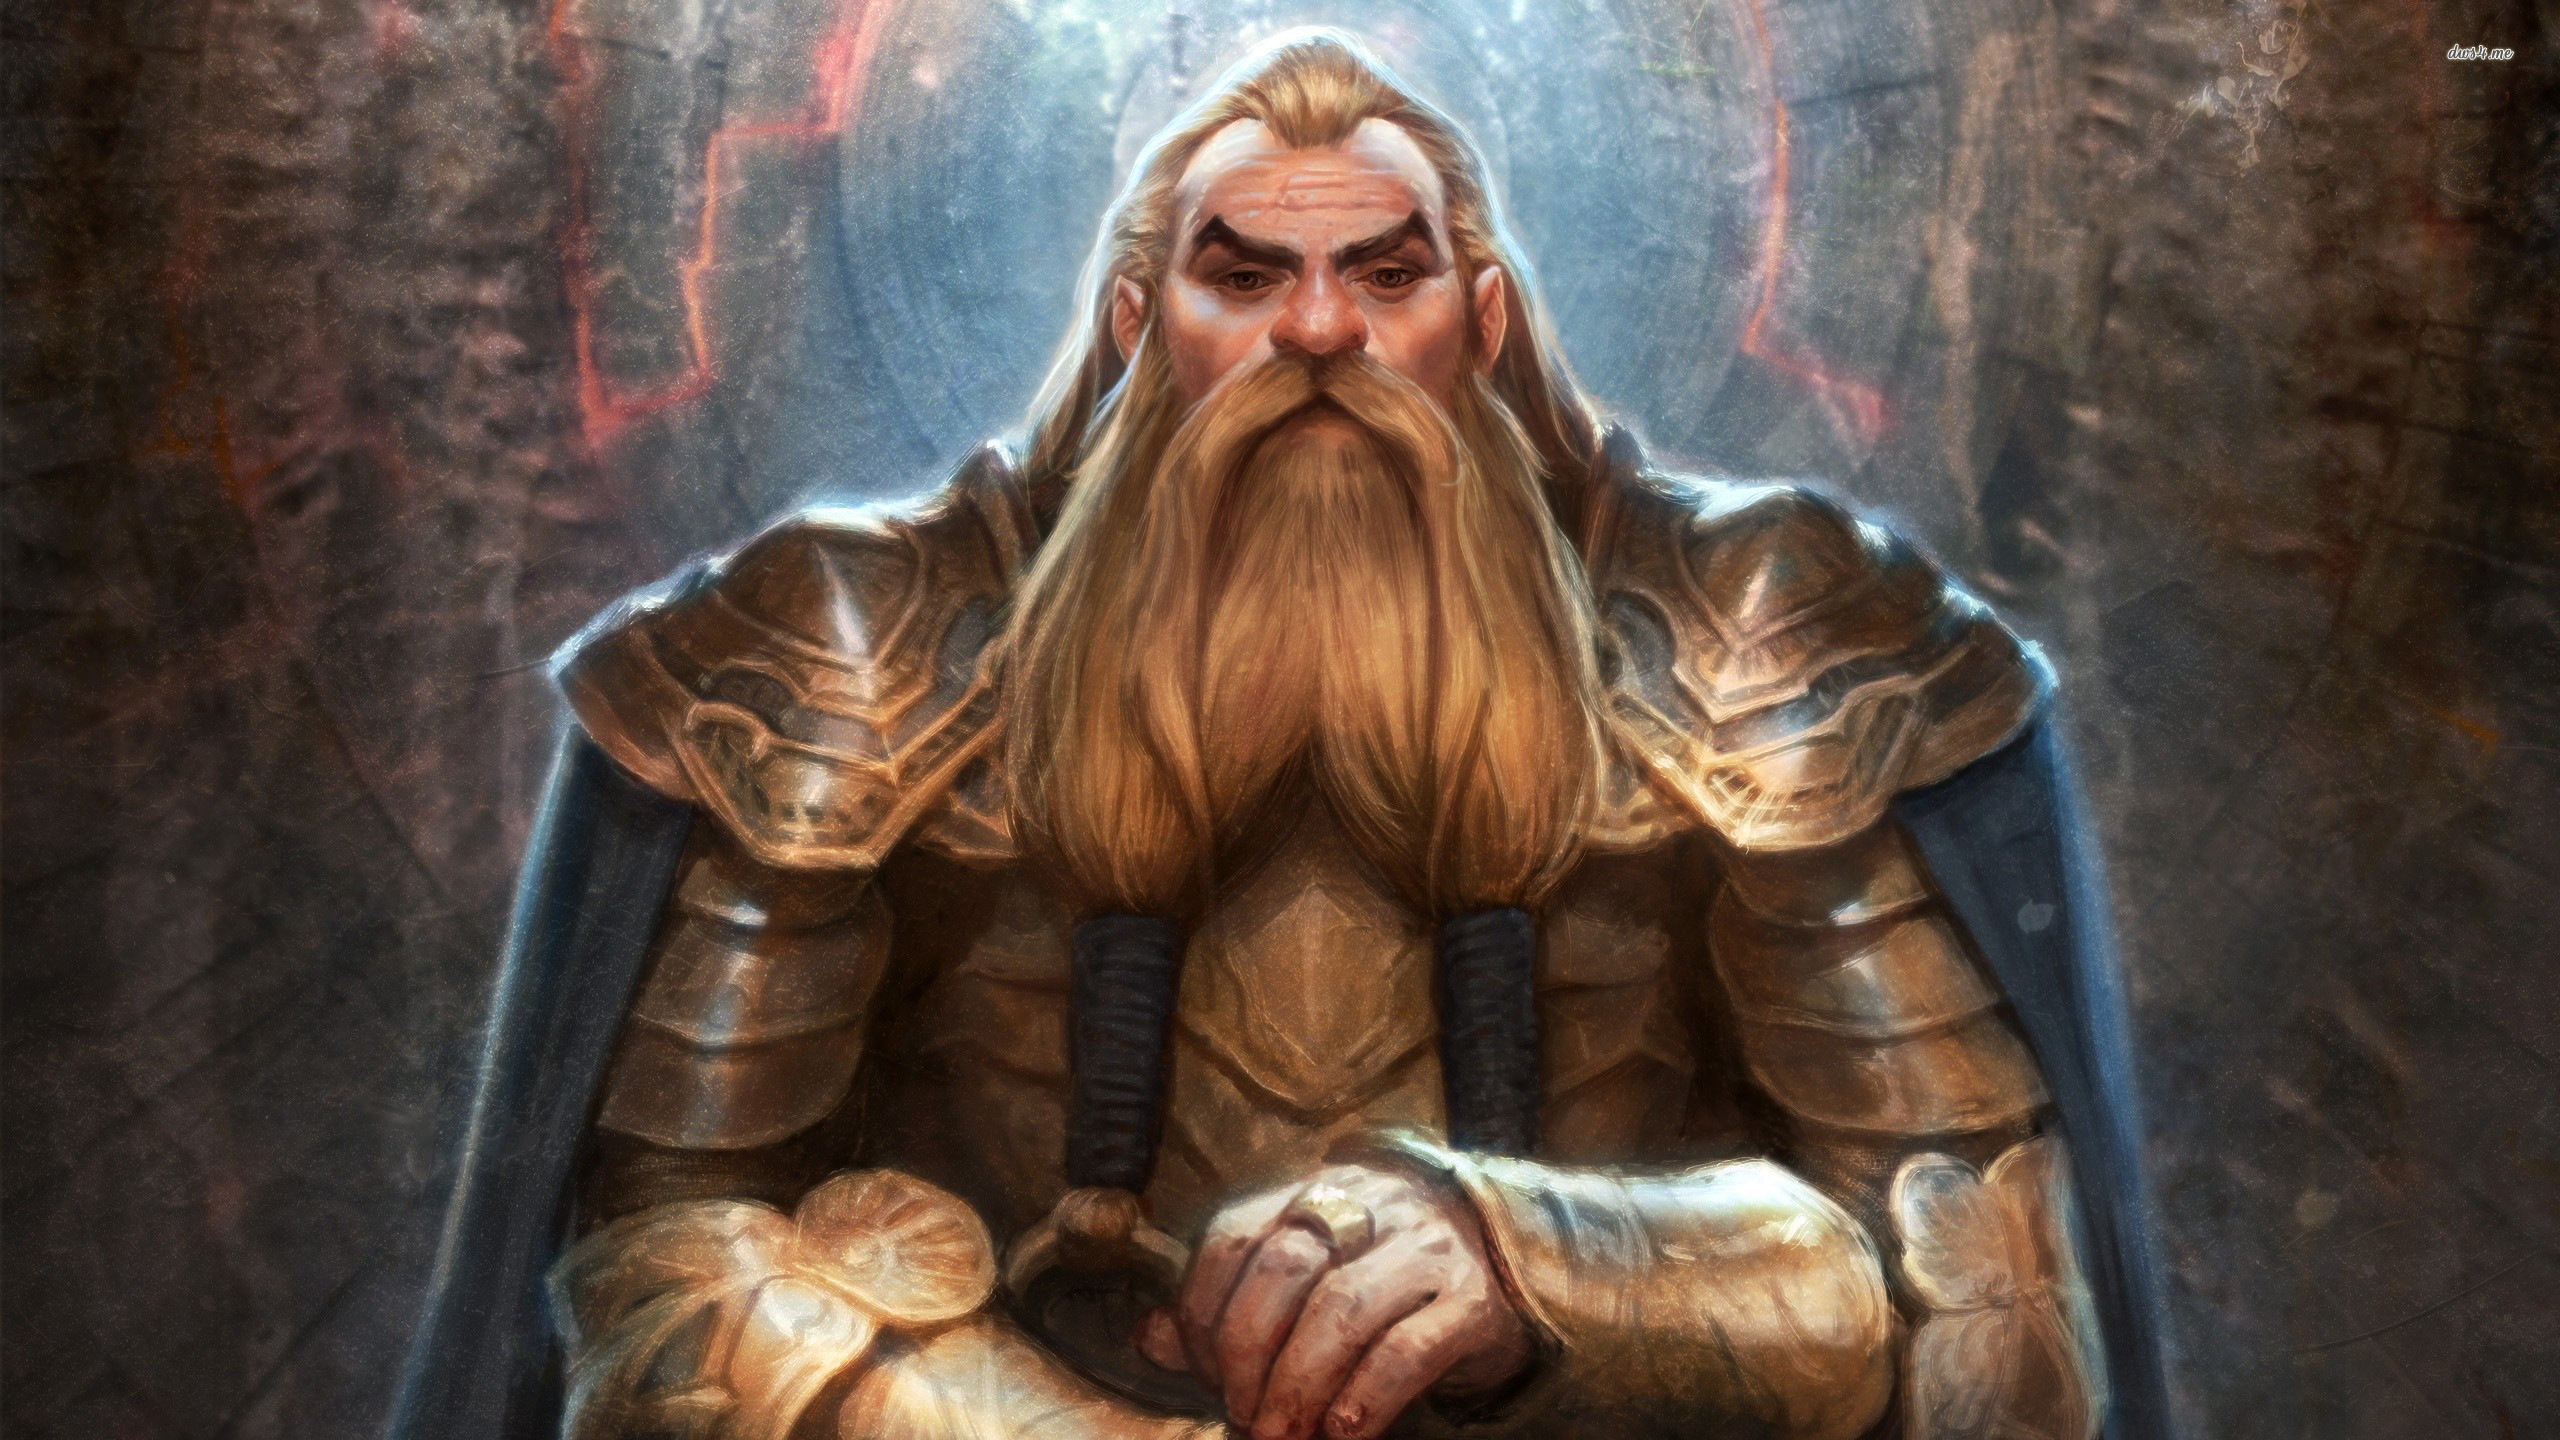 Res: 2560x1440, ... Dwarf Noble Origin - Dragon Age wallpaper  ...